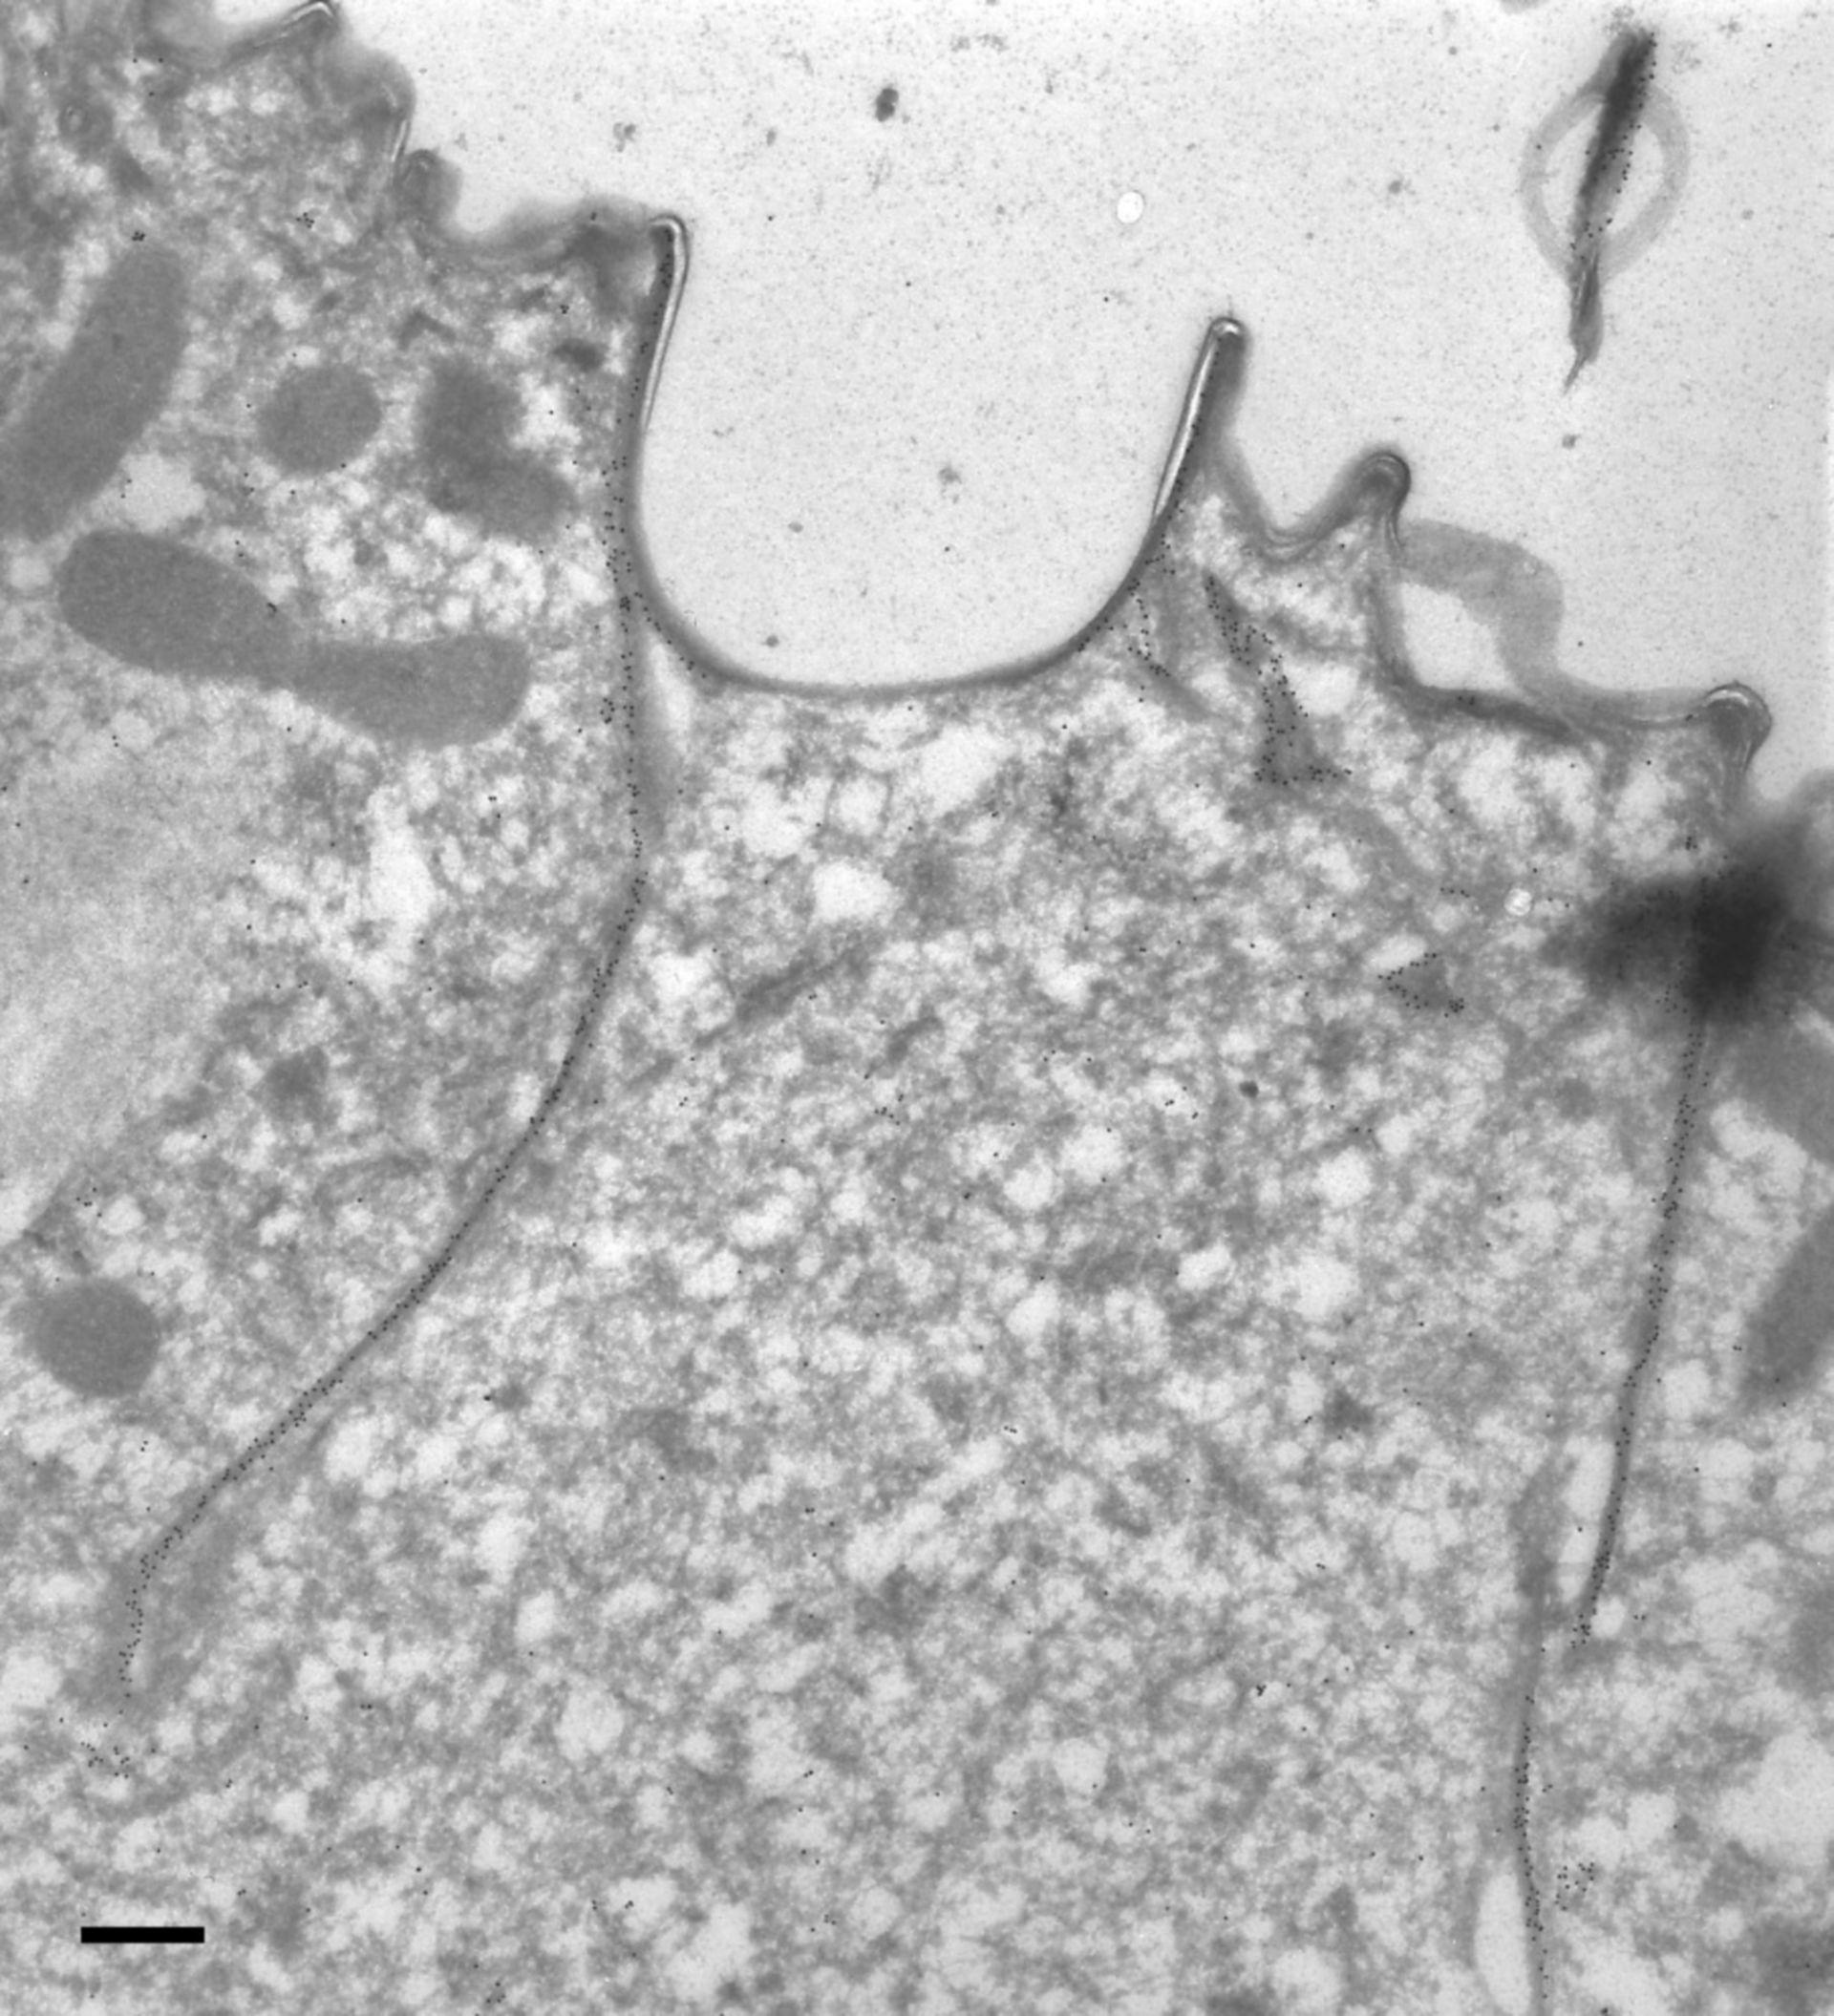 Paramecium tetraurelia (Cortical microtubule cytoskeleton) - CIL:9852